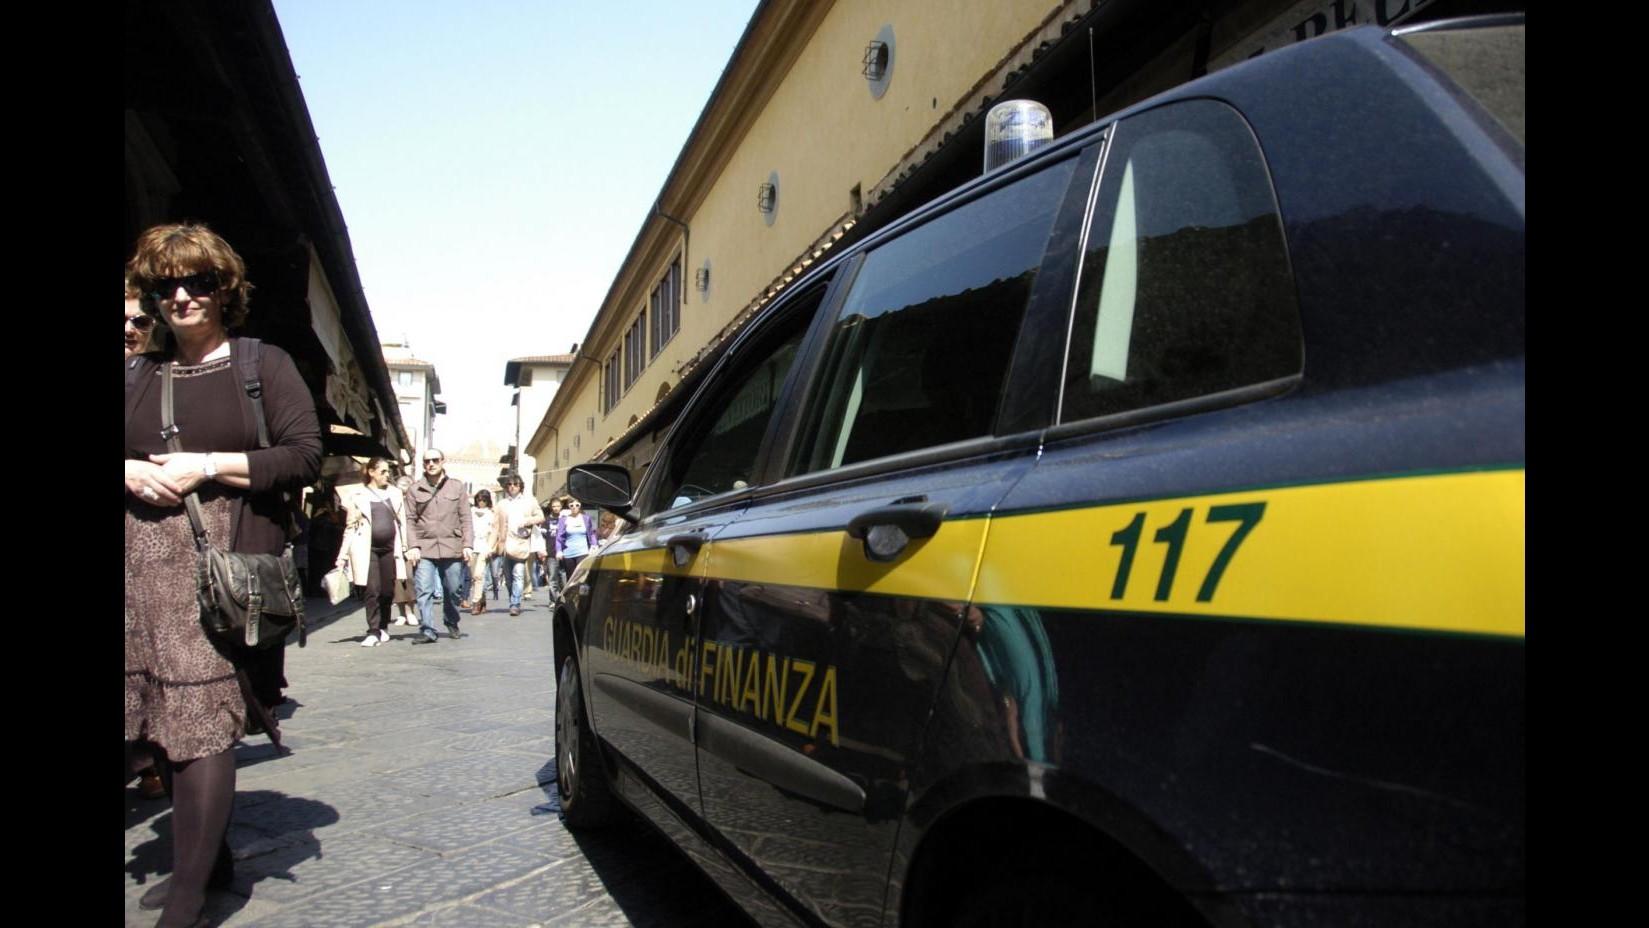 Varese, scoperta evasione fiscale di oltre 9 milioni di euro